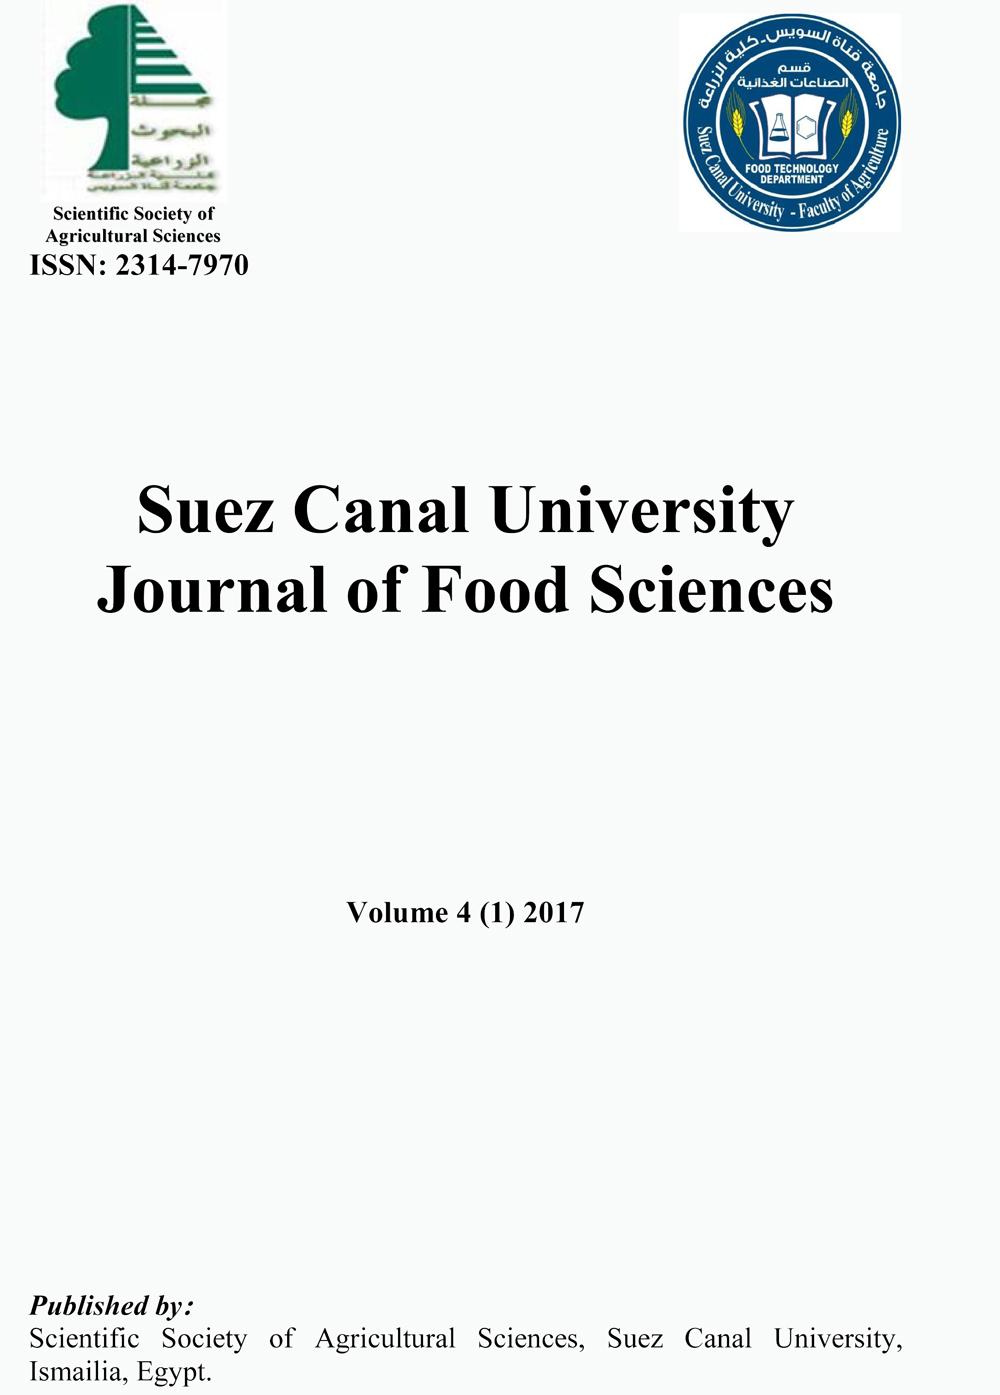 Suez Canal University Journal of Food Sciences